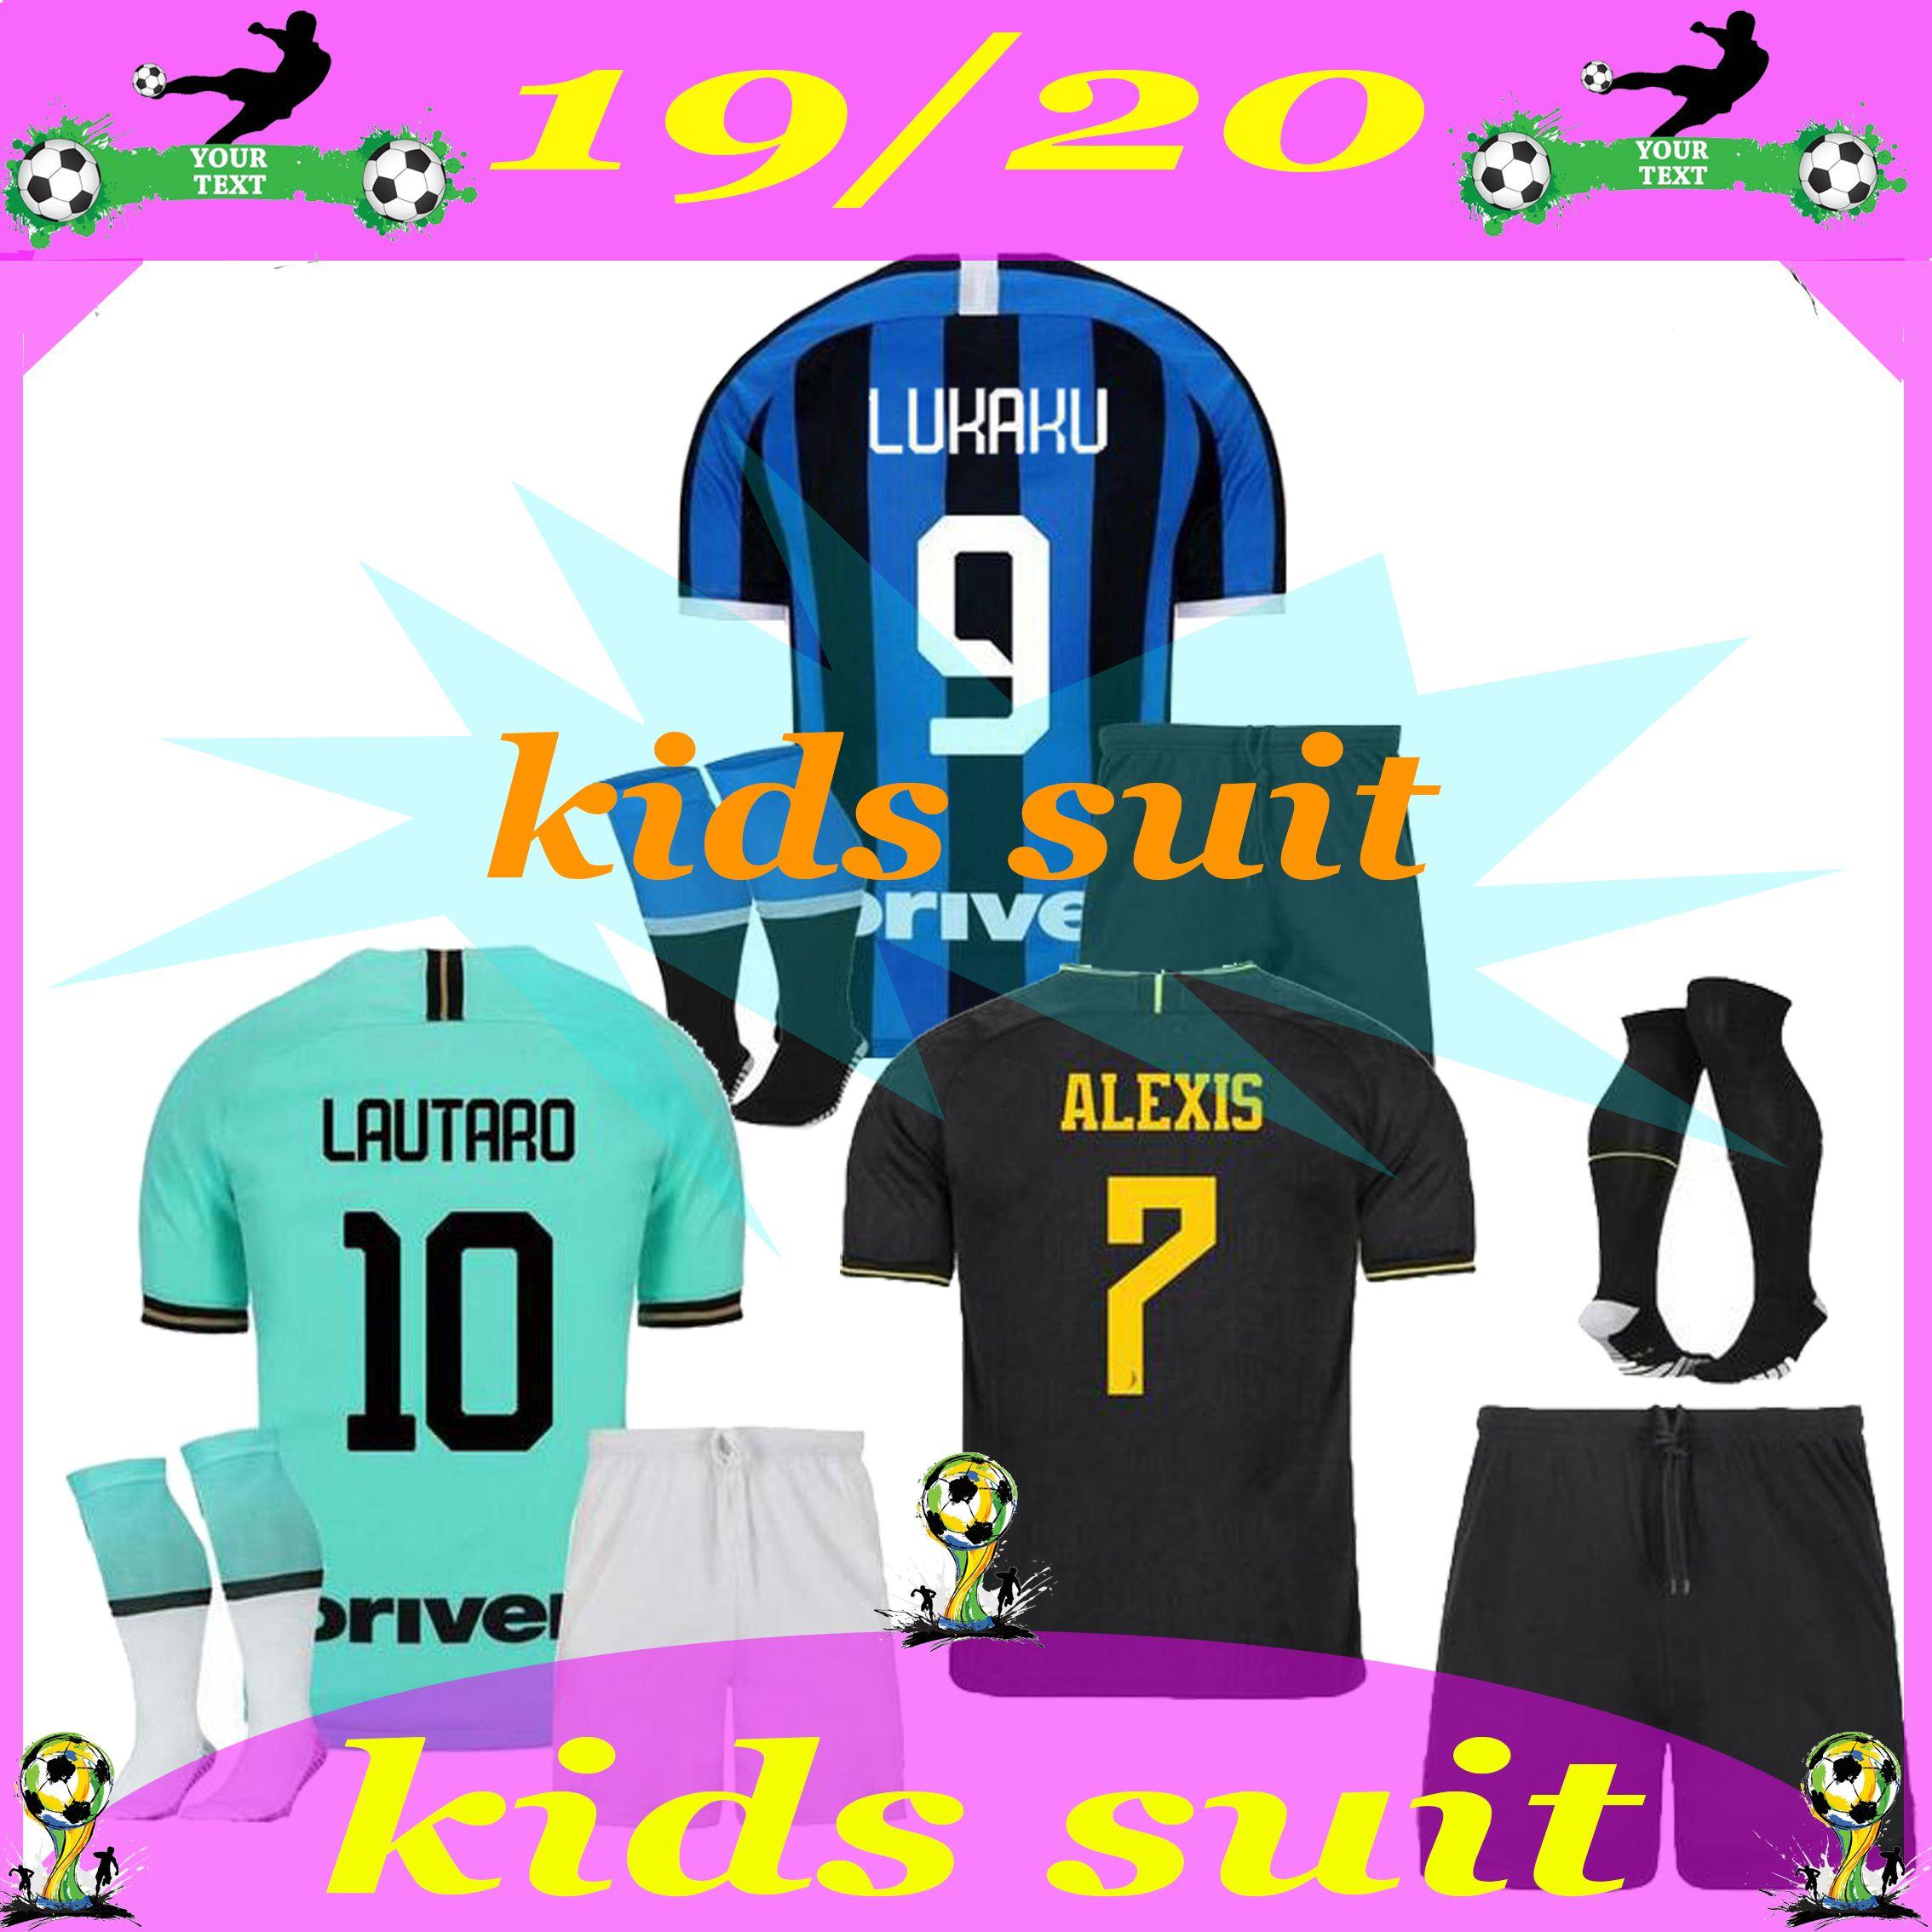 kids suit LUKAKU ALEXIS Inter Skriniar Barella 2019 2020 Milan soccer jerseys maillot de foot Lautaro Godín D'Ambrosio football jersey